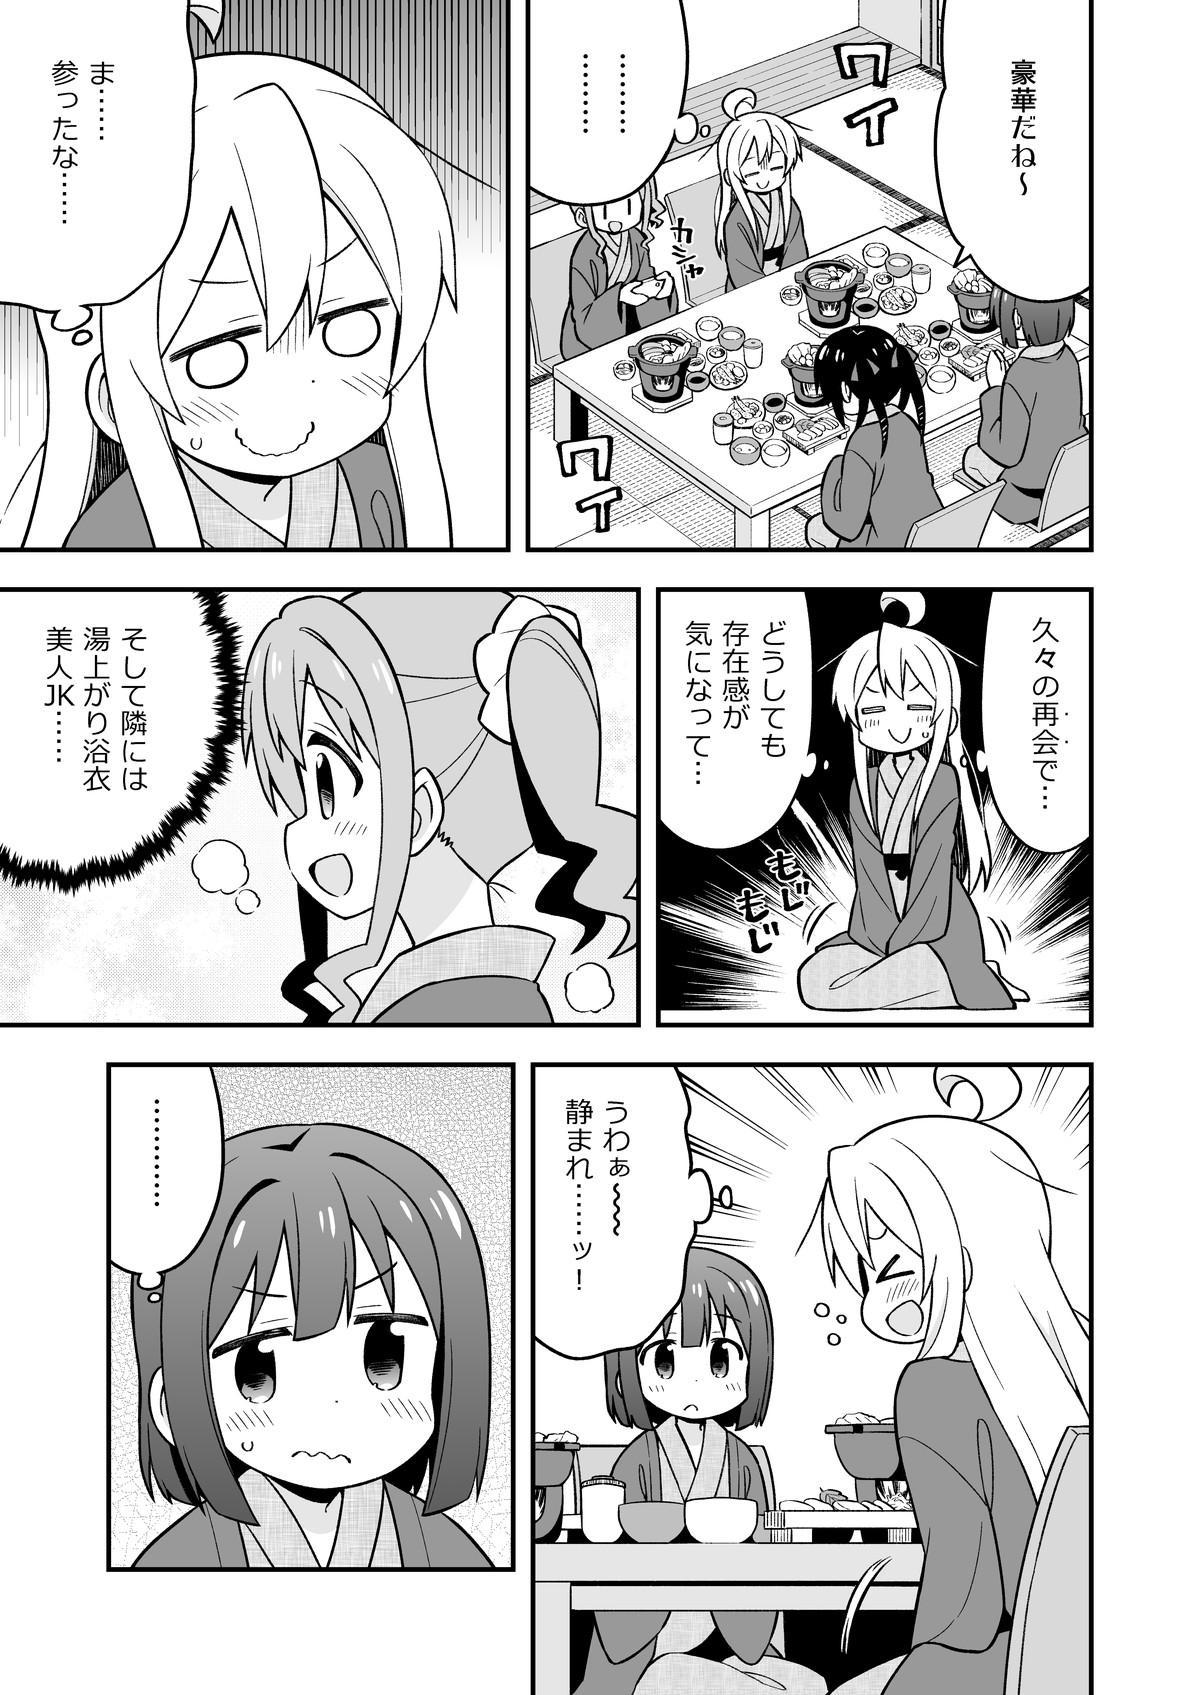 Onii-chan wa Oshimai! 6 37